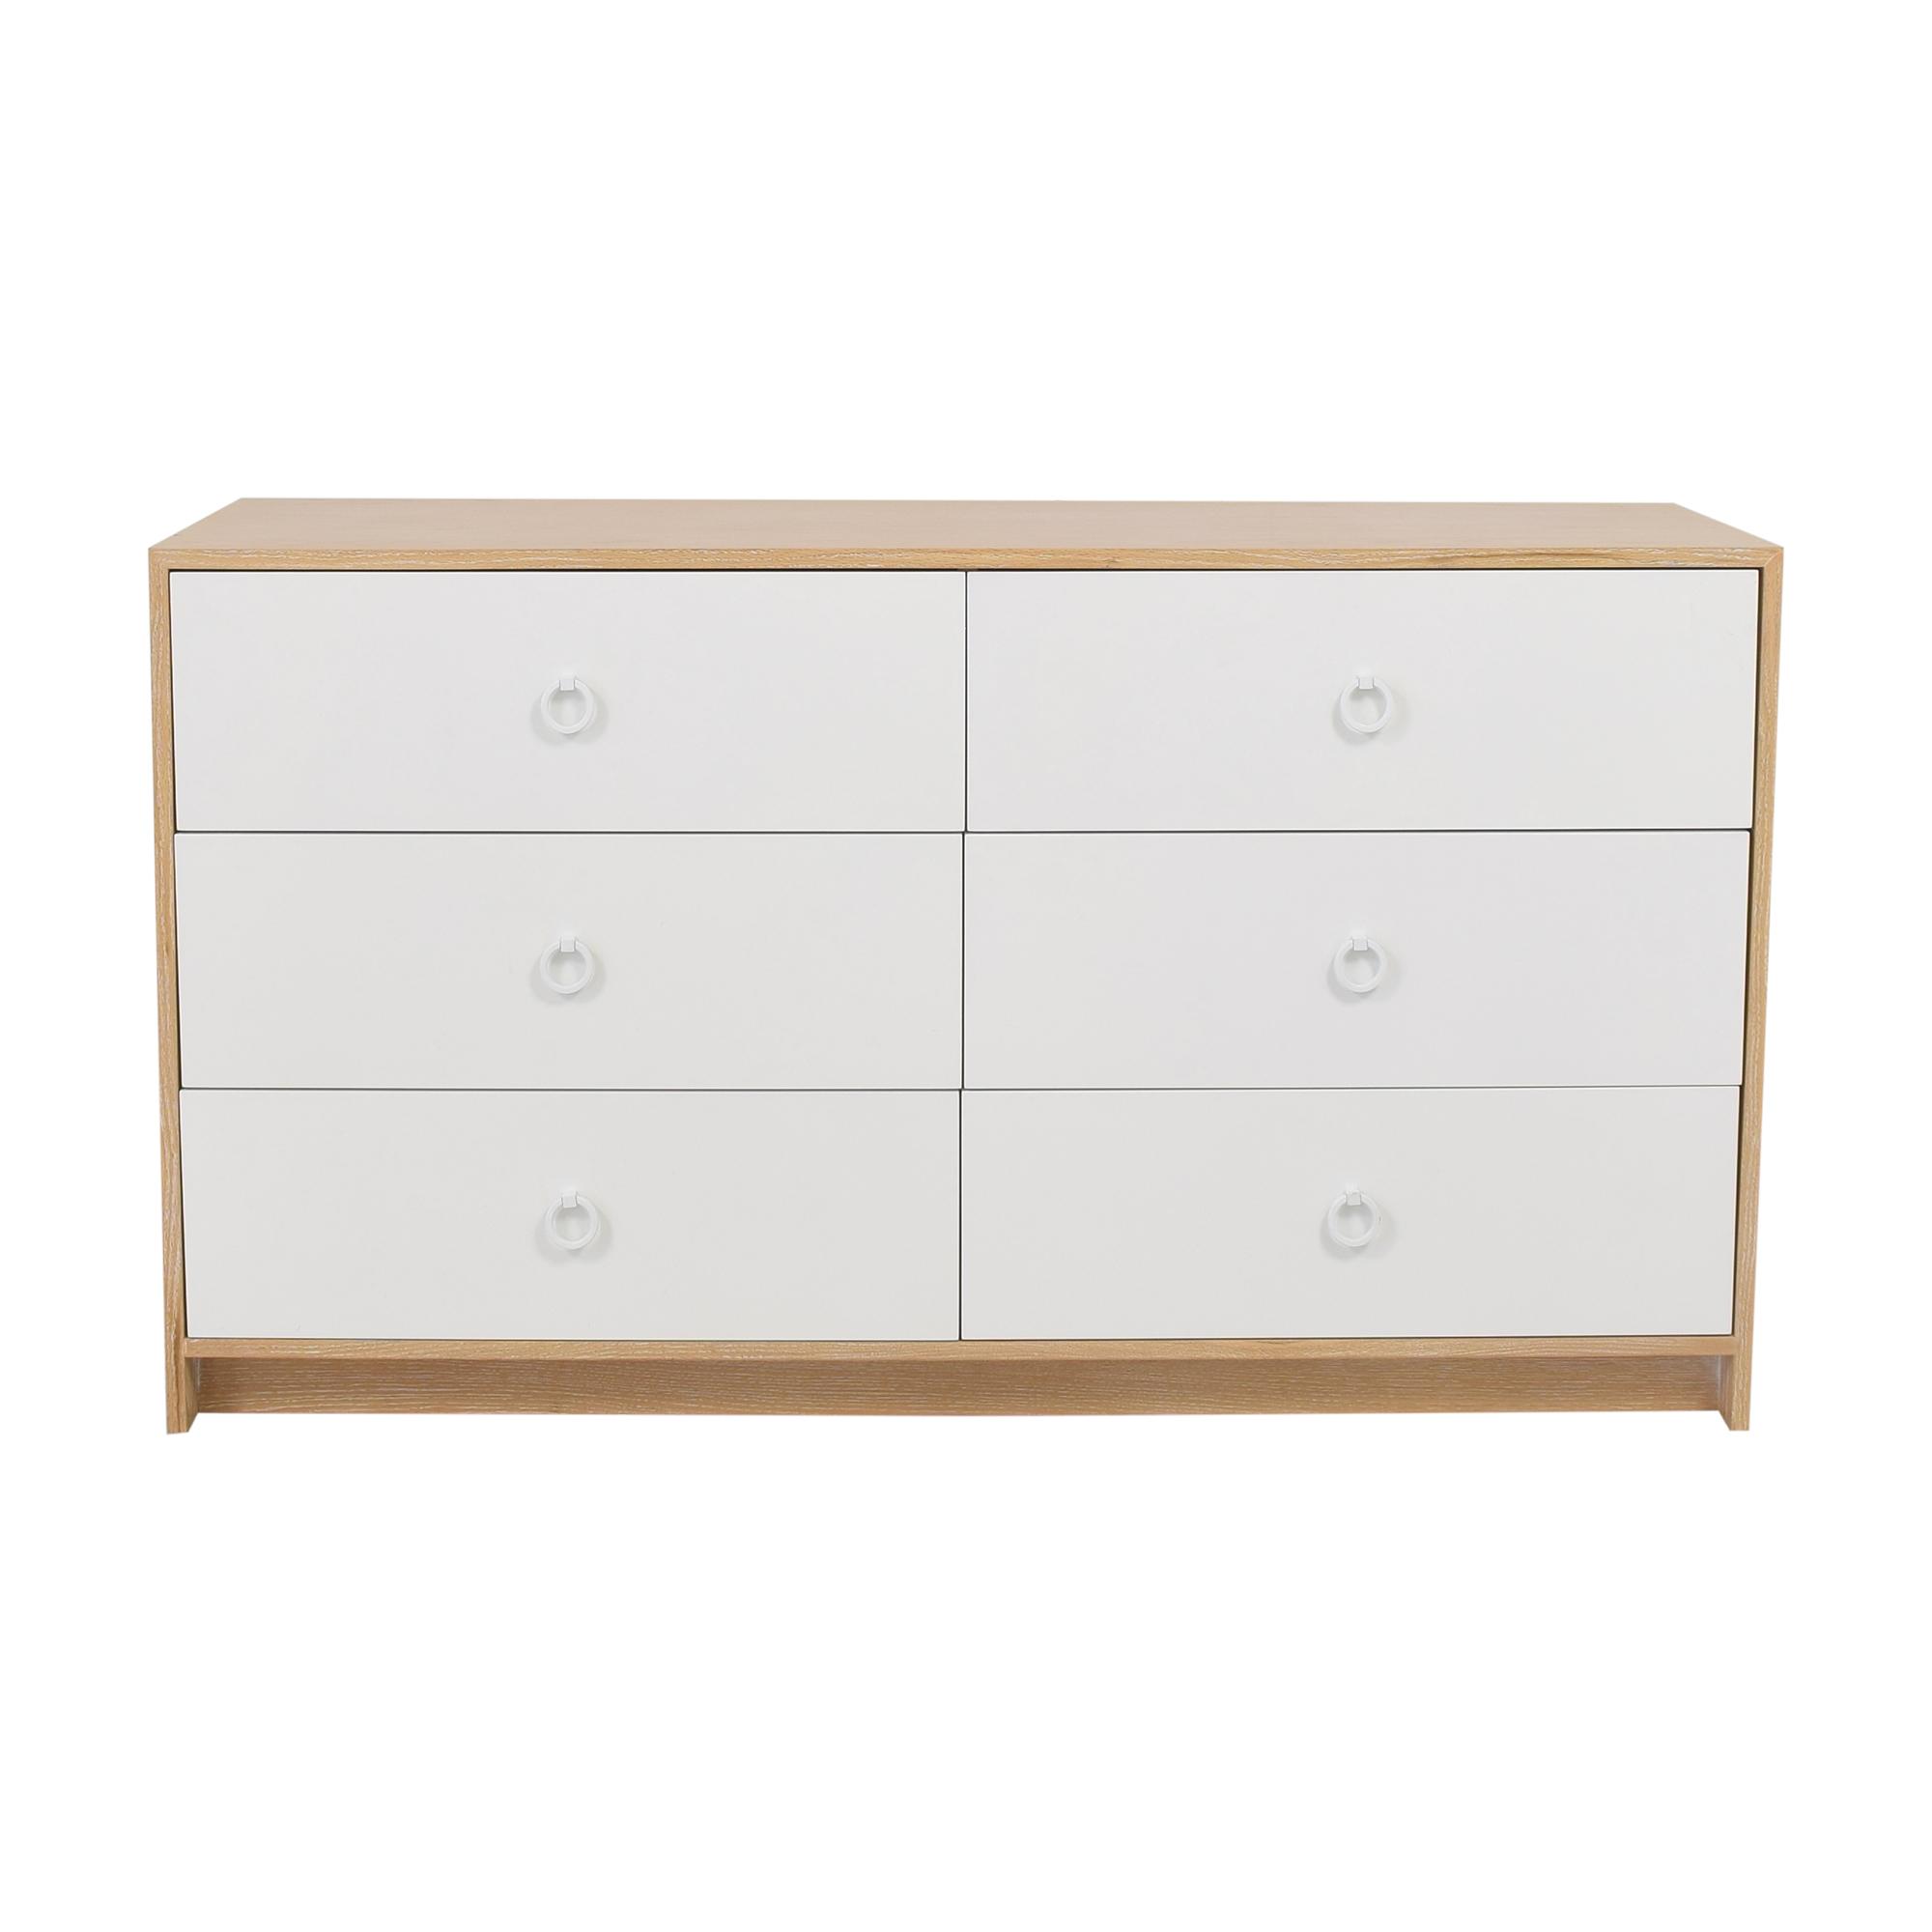 ducduc ducduc Cabana Doublewide Six Drawer Dresser discount